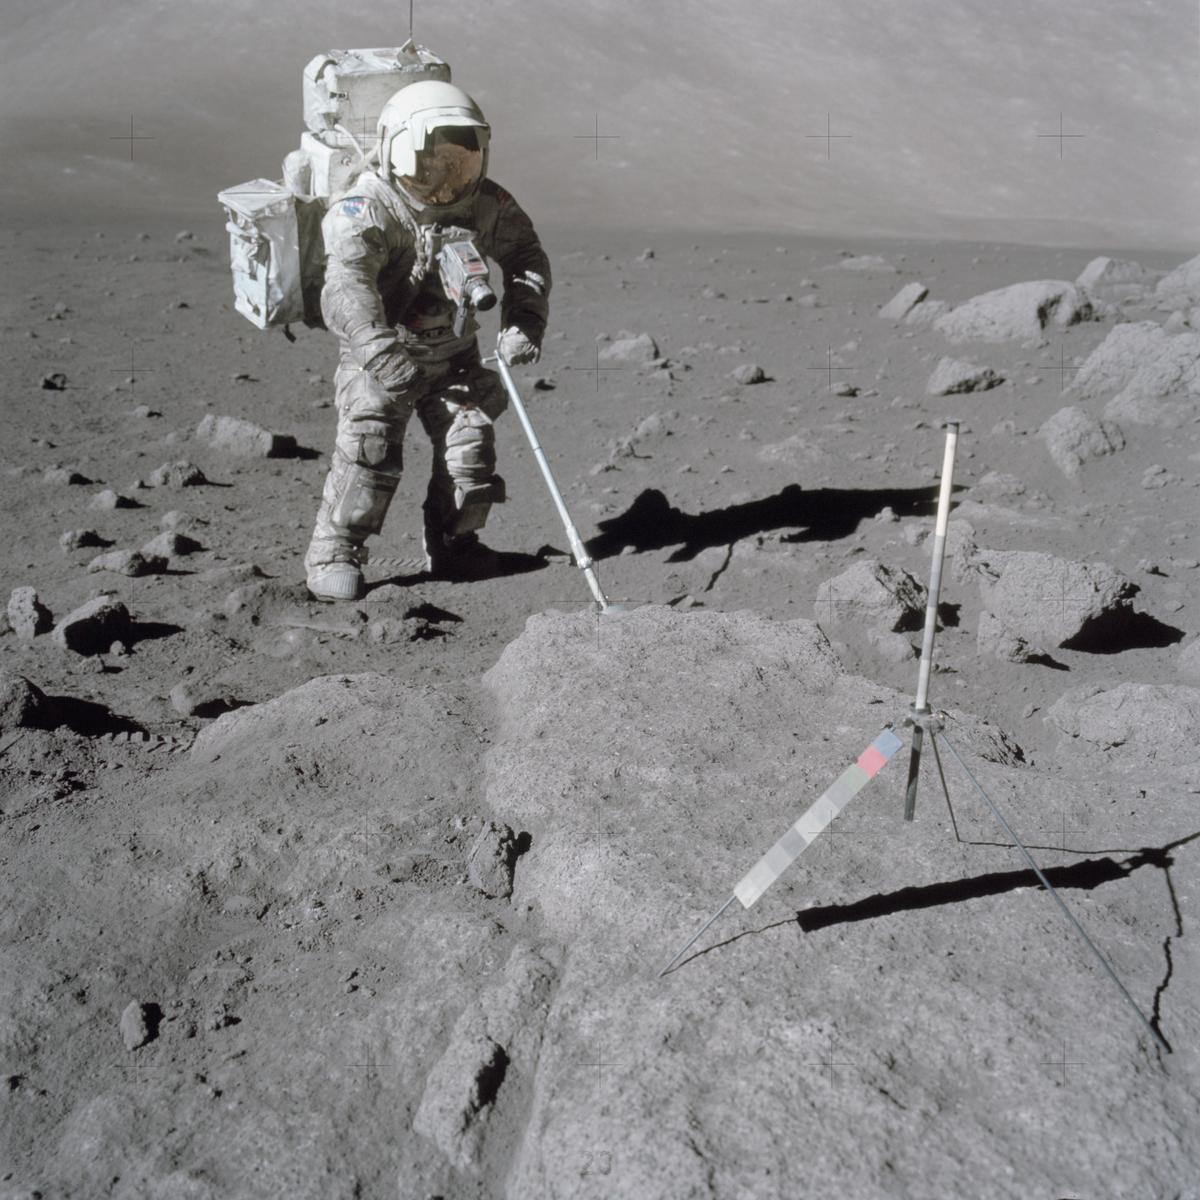 lunar dust in space - photo #15